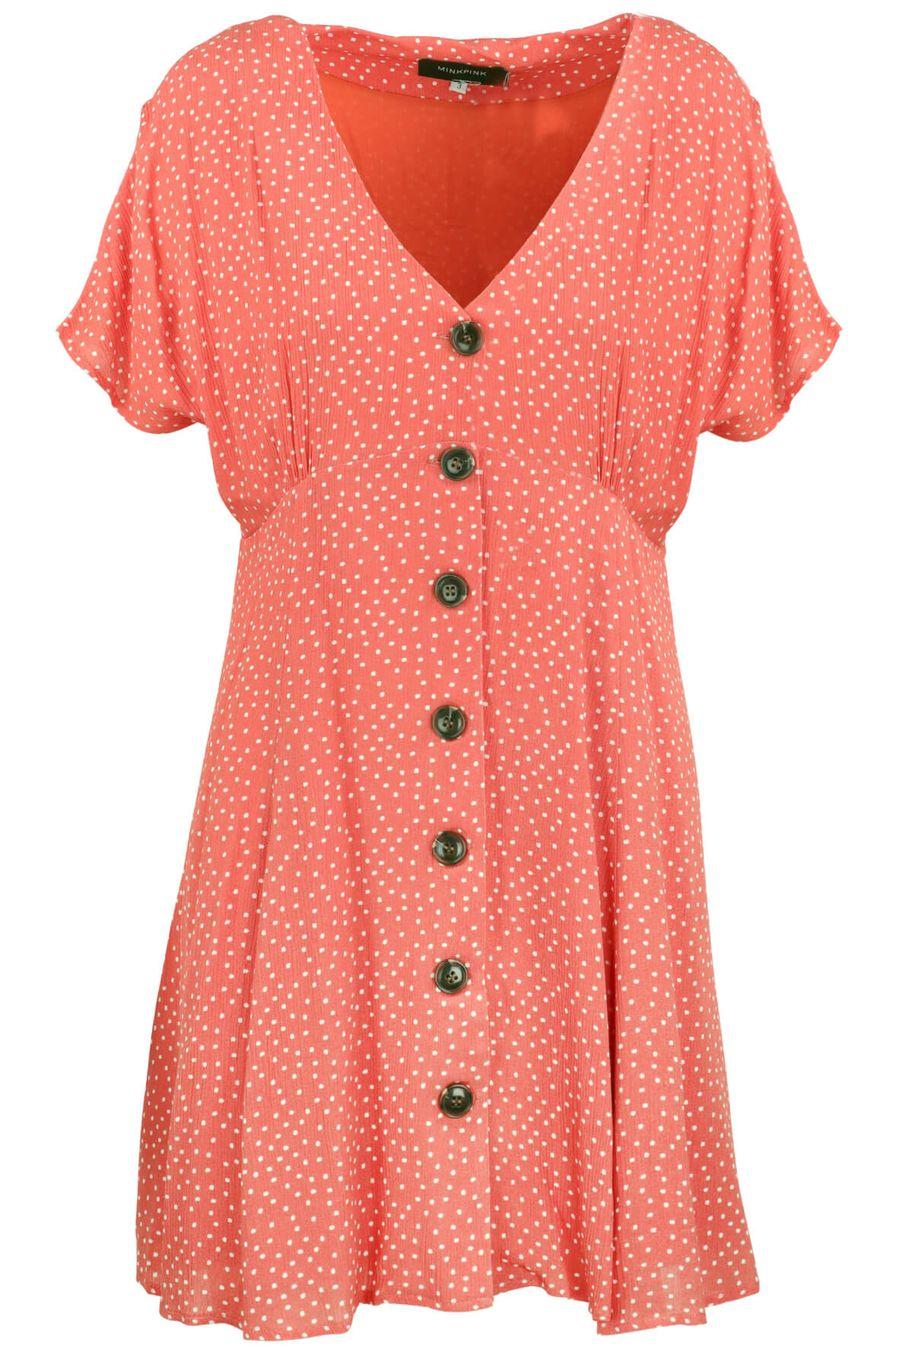 minkpink-kindred-button-front-dress-1